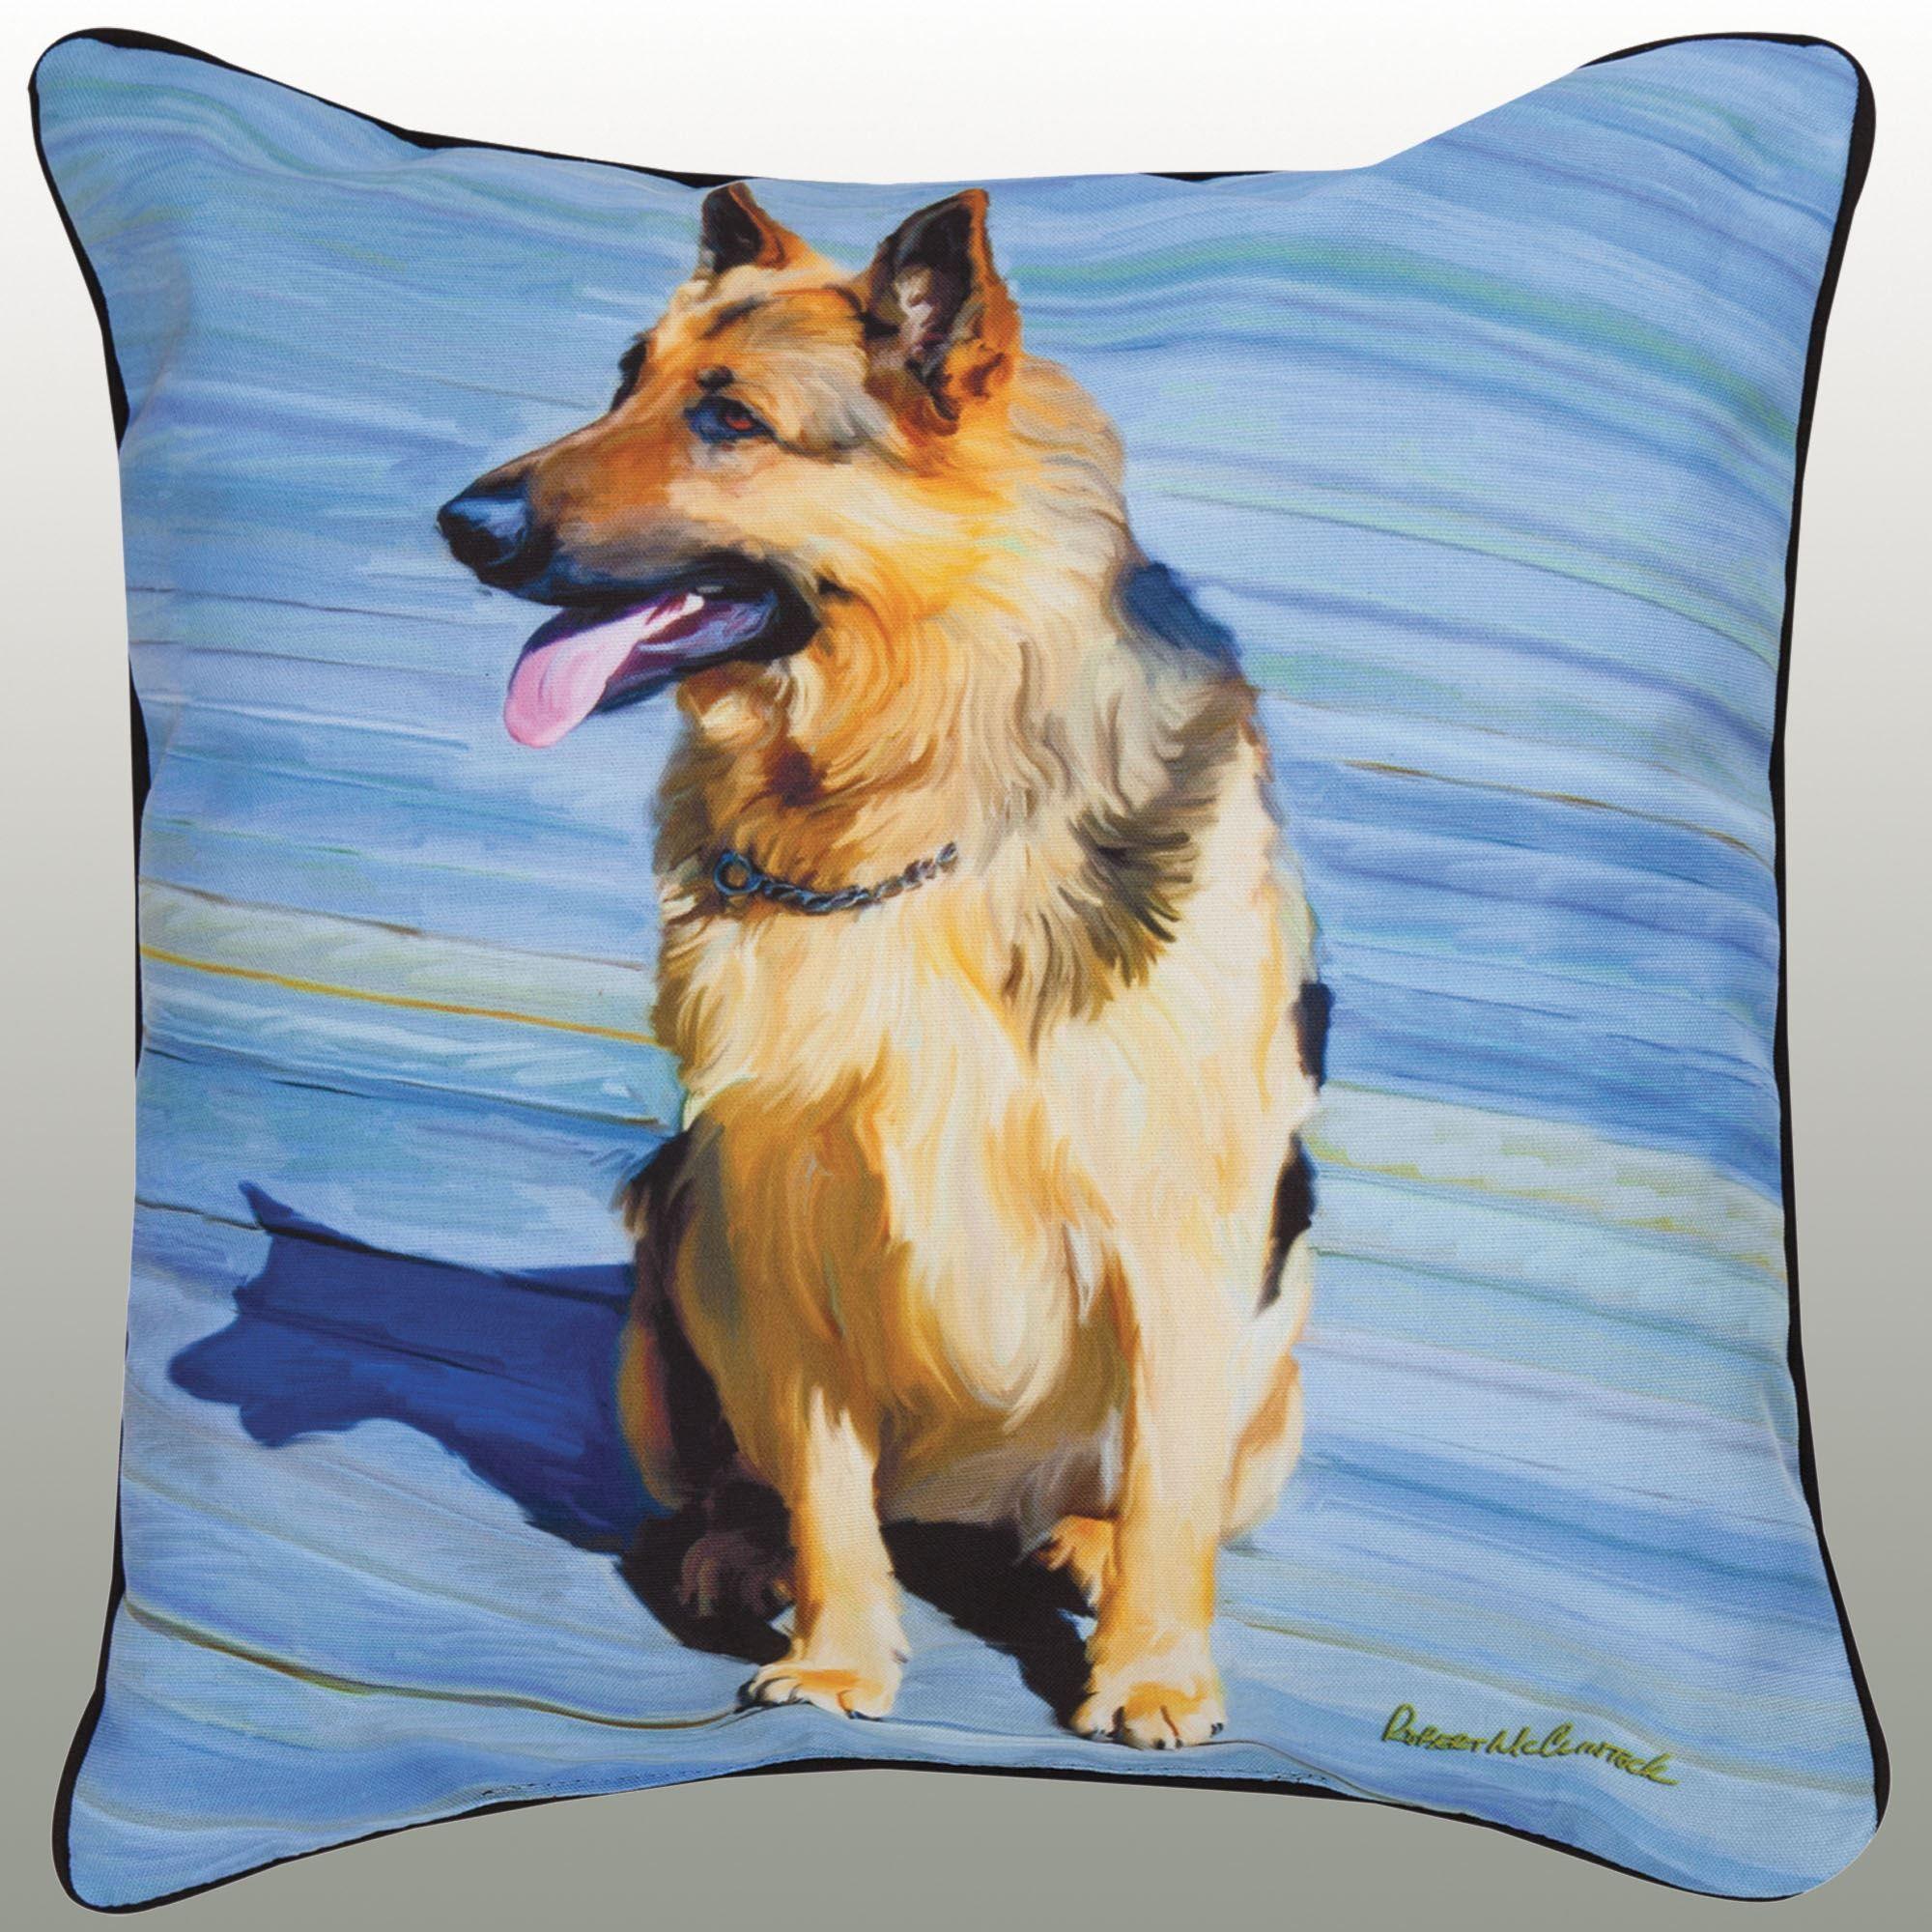 german shepherd decorative dog pillow